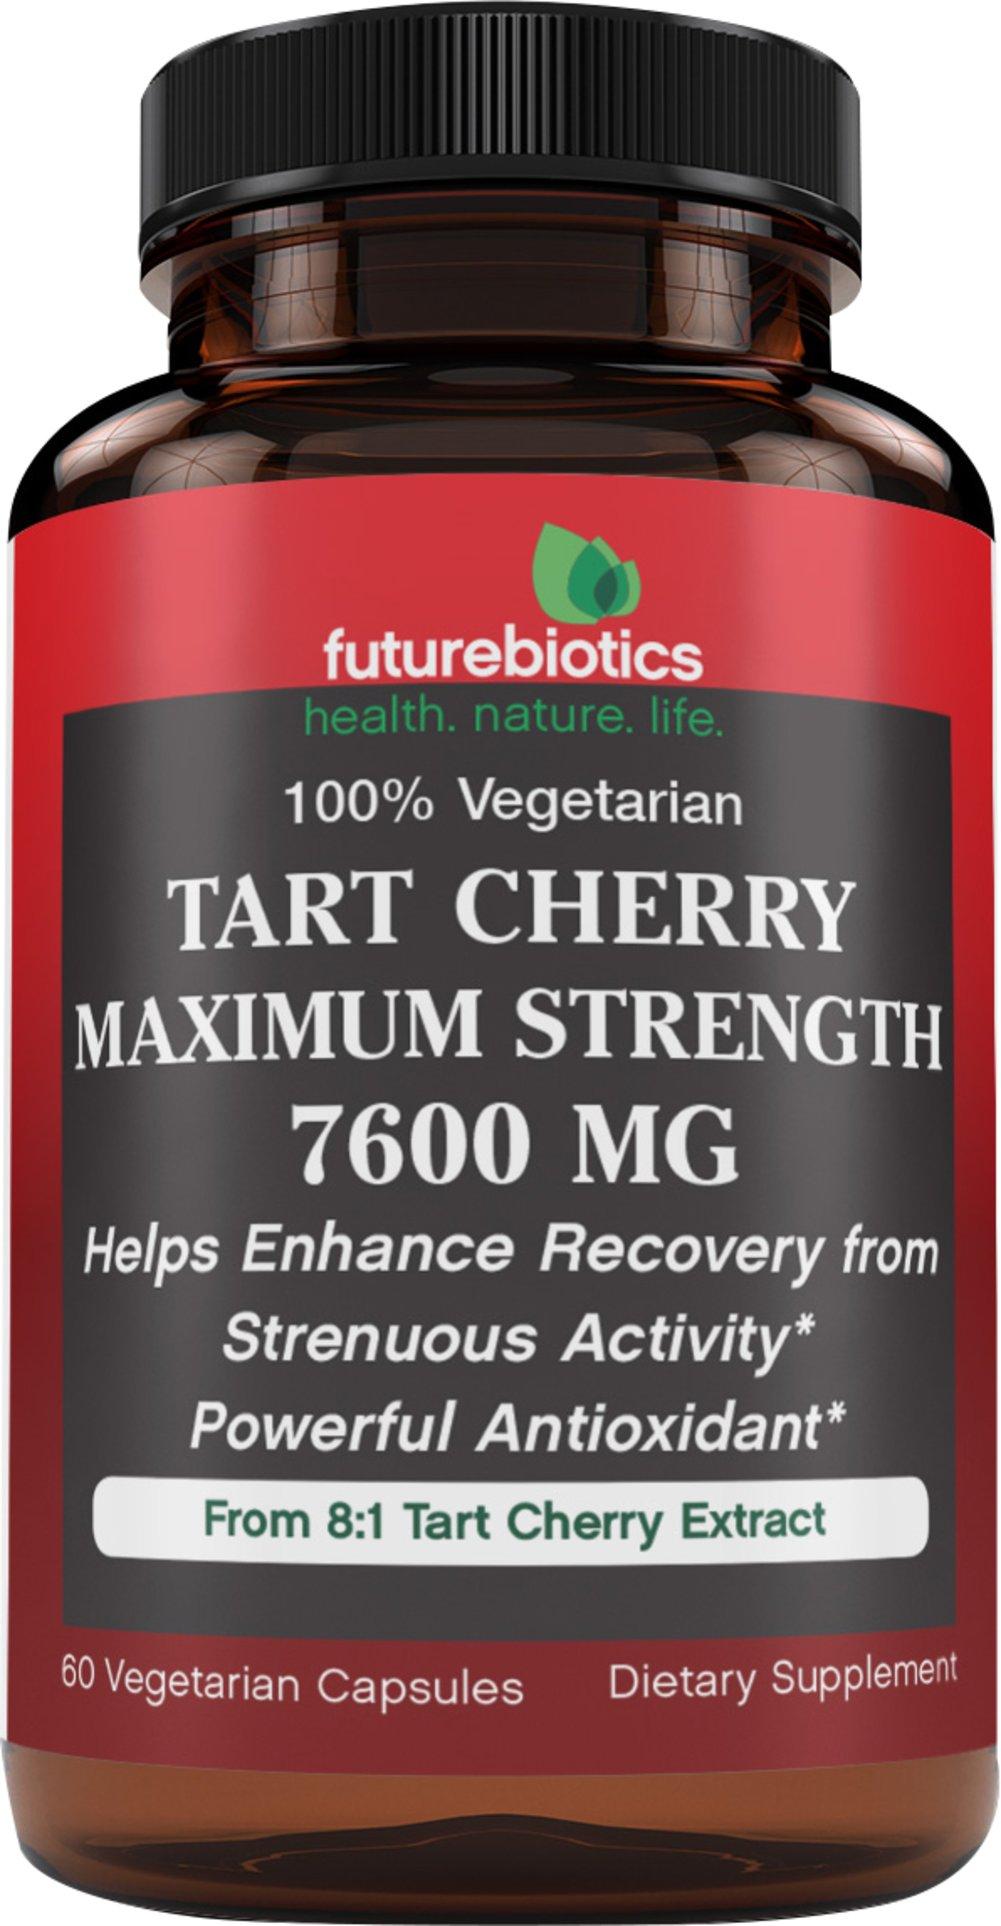 Futurebiotics VitaCherry Tart Cherry 475 mg-60 Vegi Caps 055902